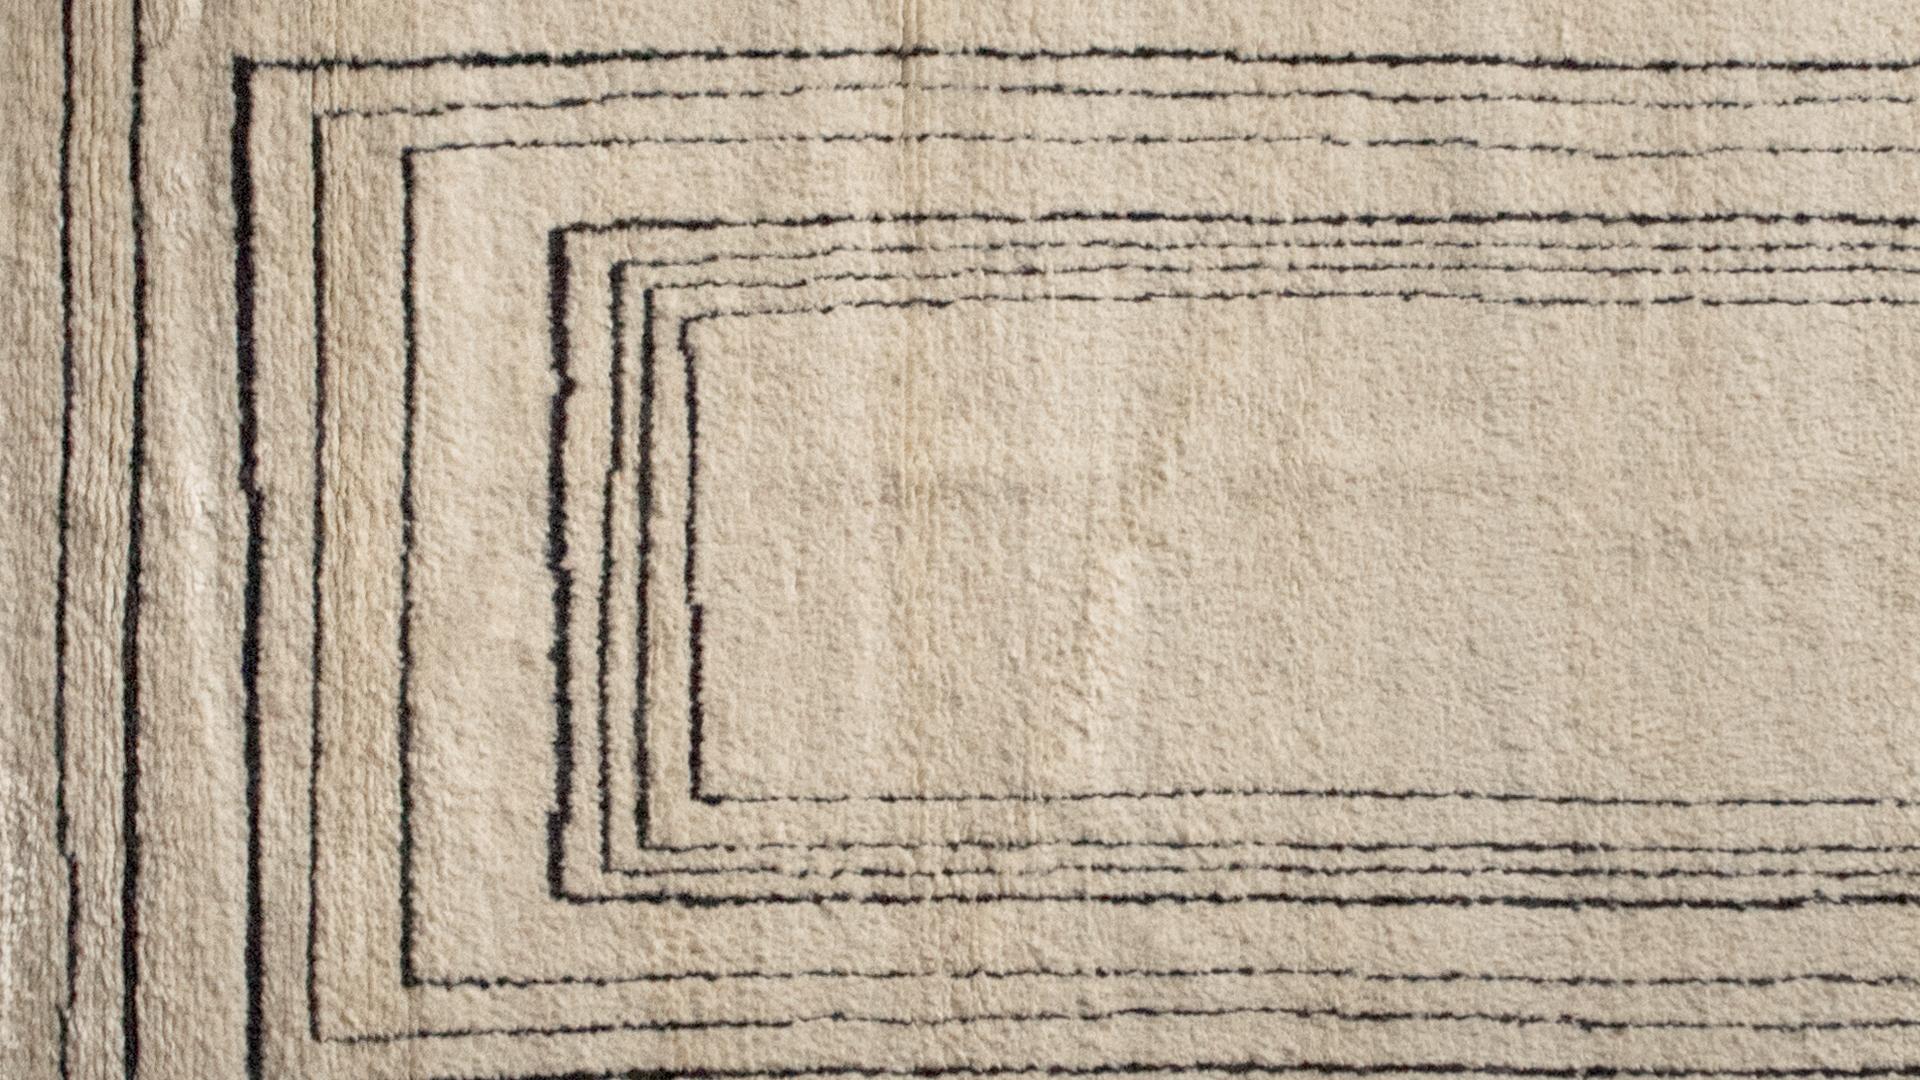 Baxter Berbere Natural + Black Pattern B carpet.jpg